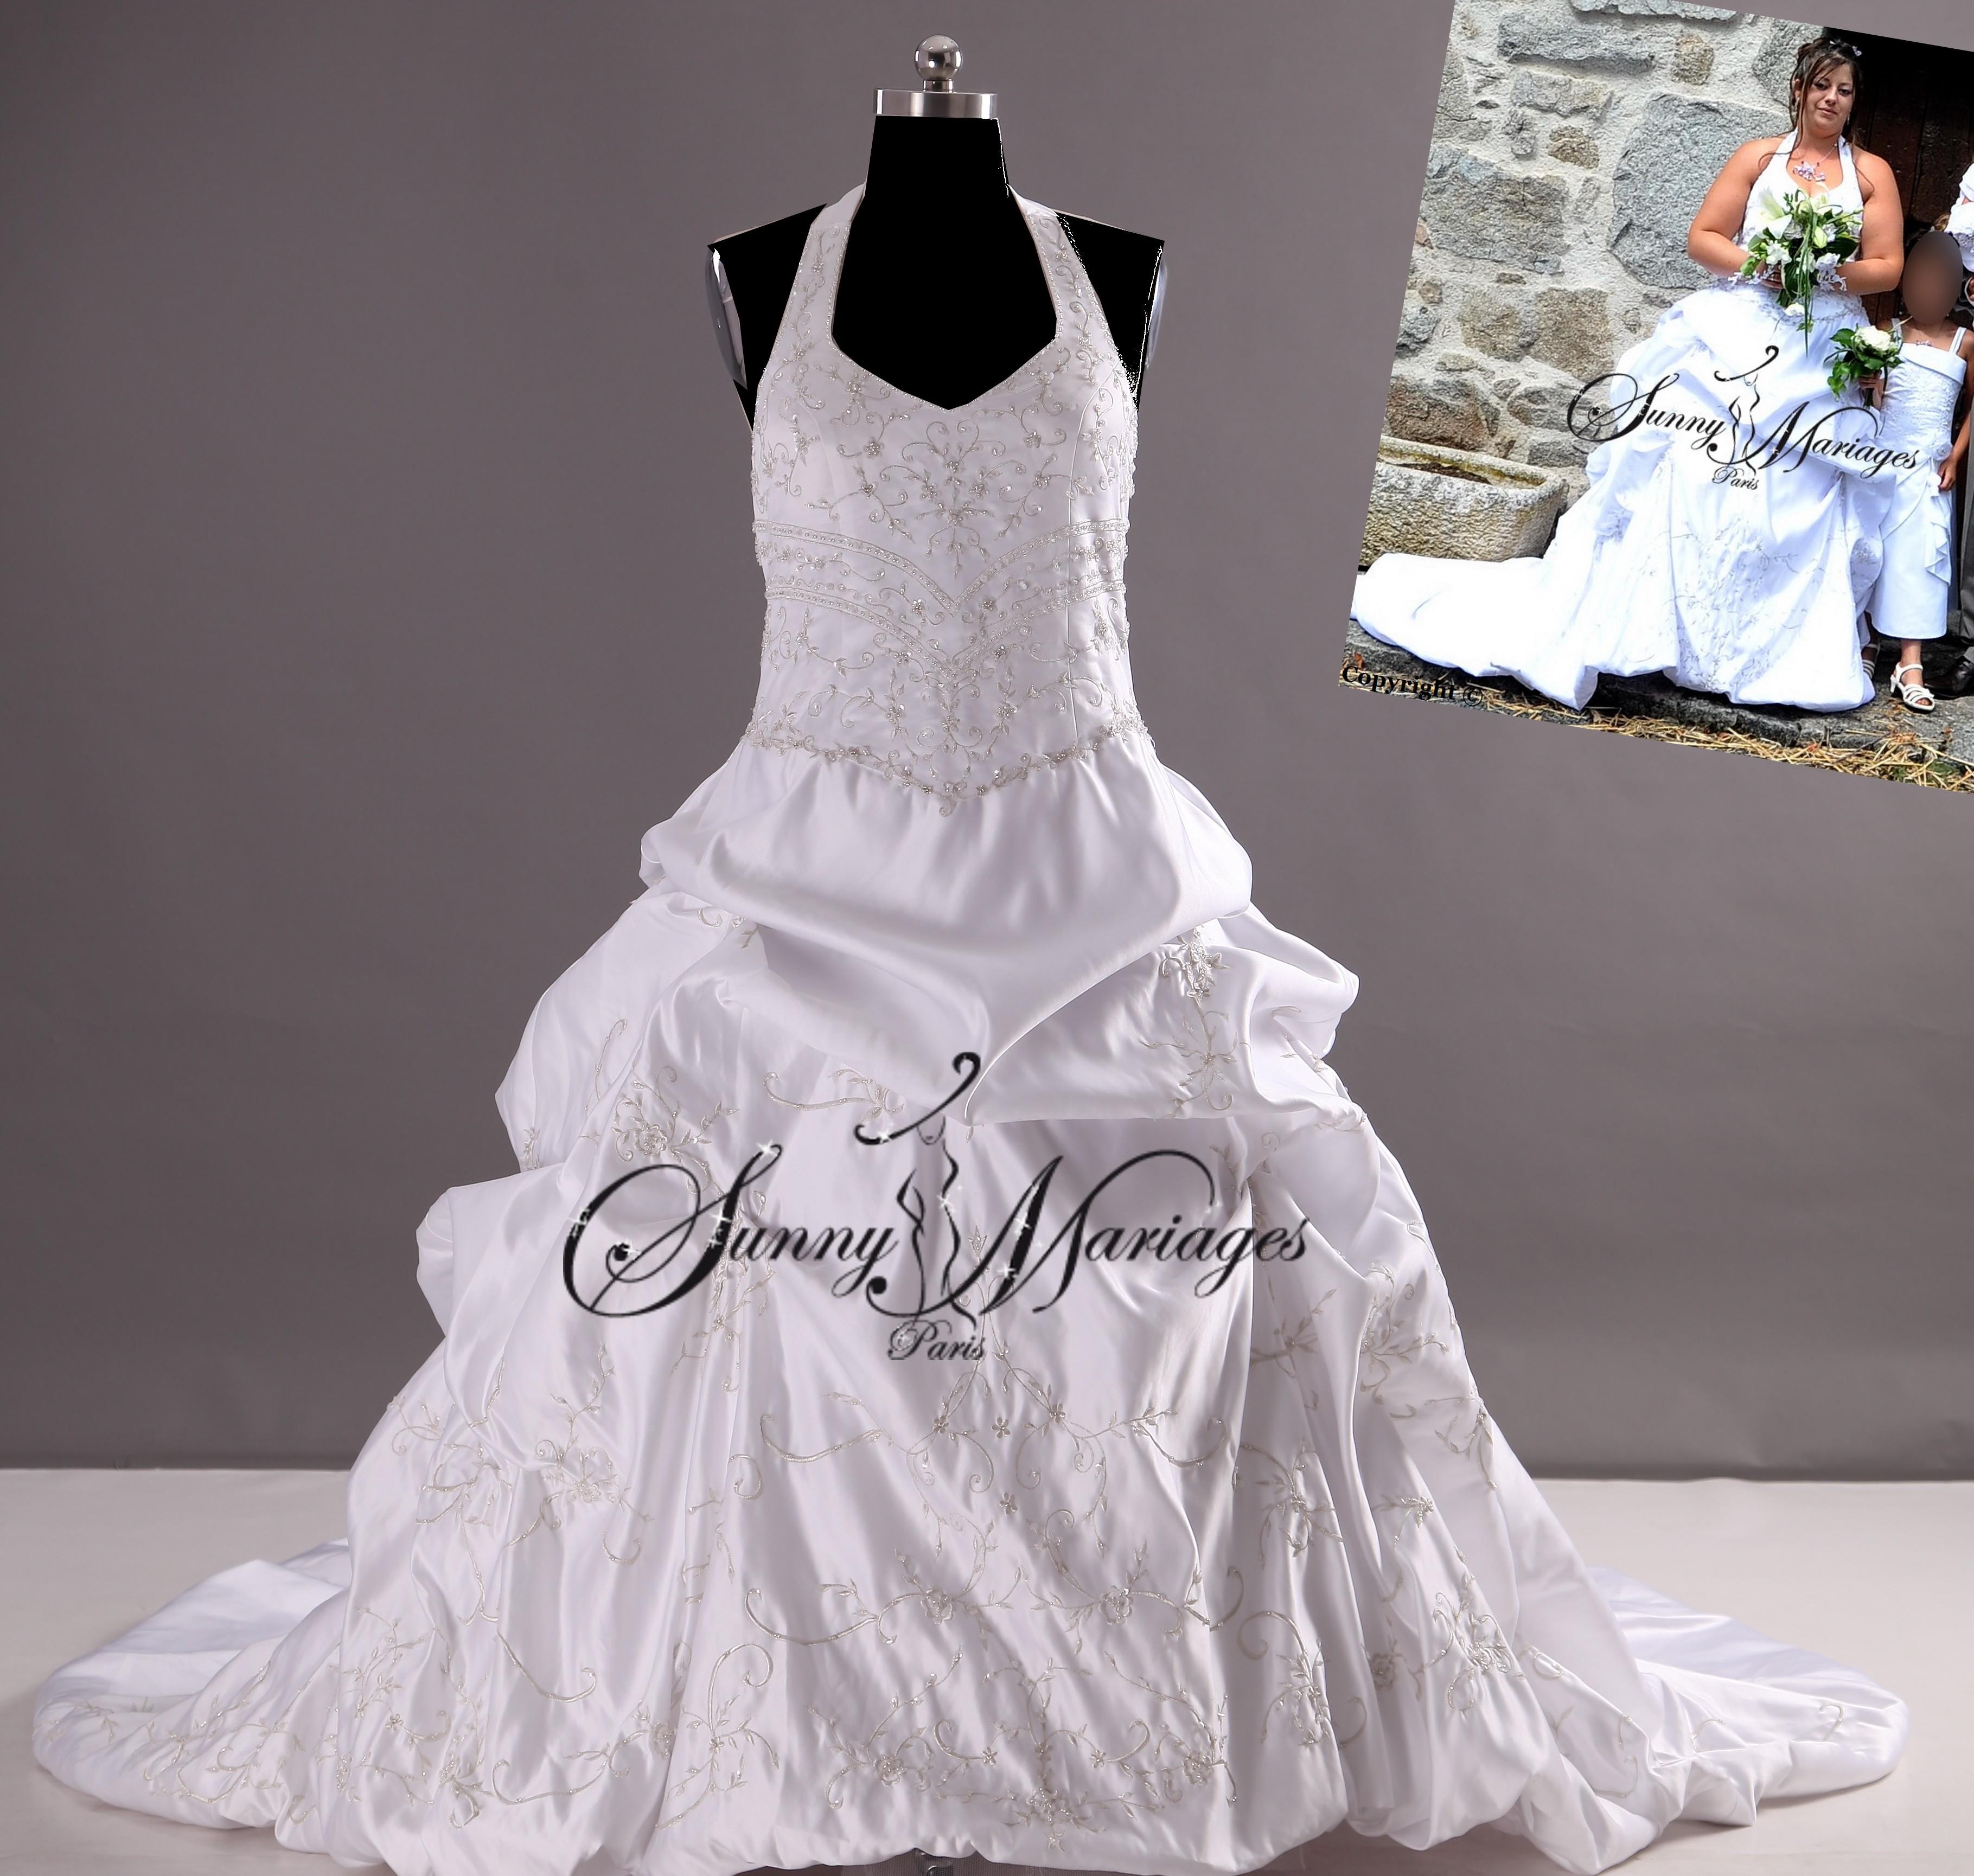 robe de mariee princesse r alisable en grande taille sunny mariage. Black Bedroom Furniture Sets. Home Design Ideas